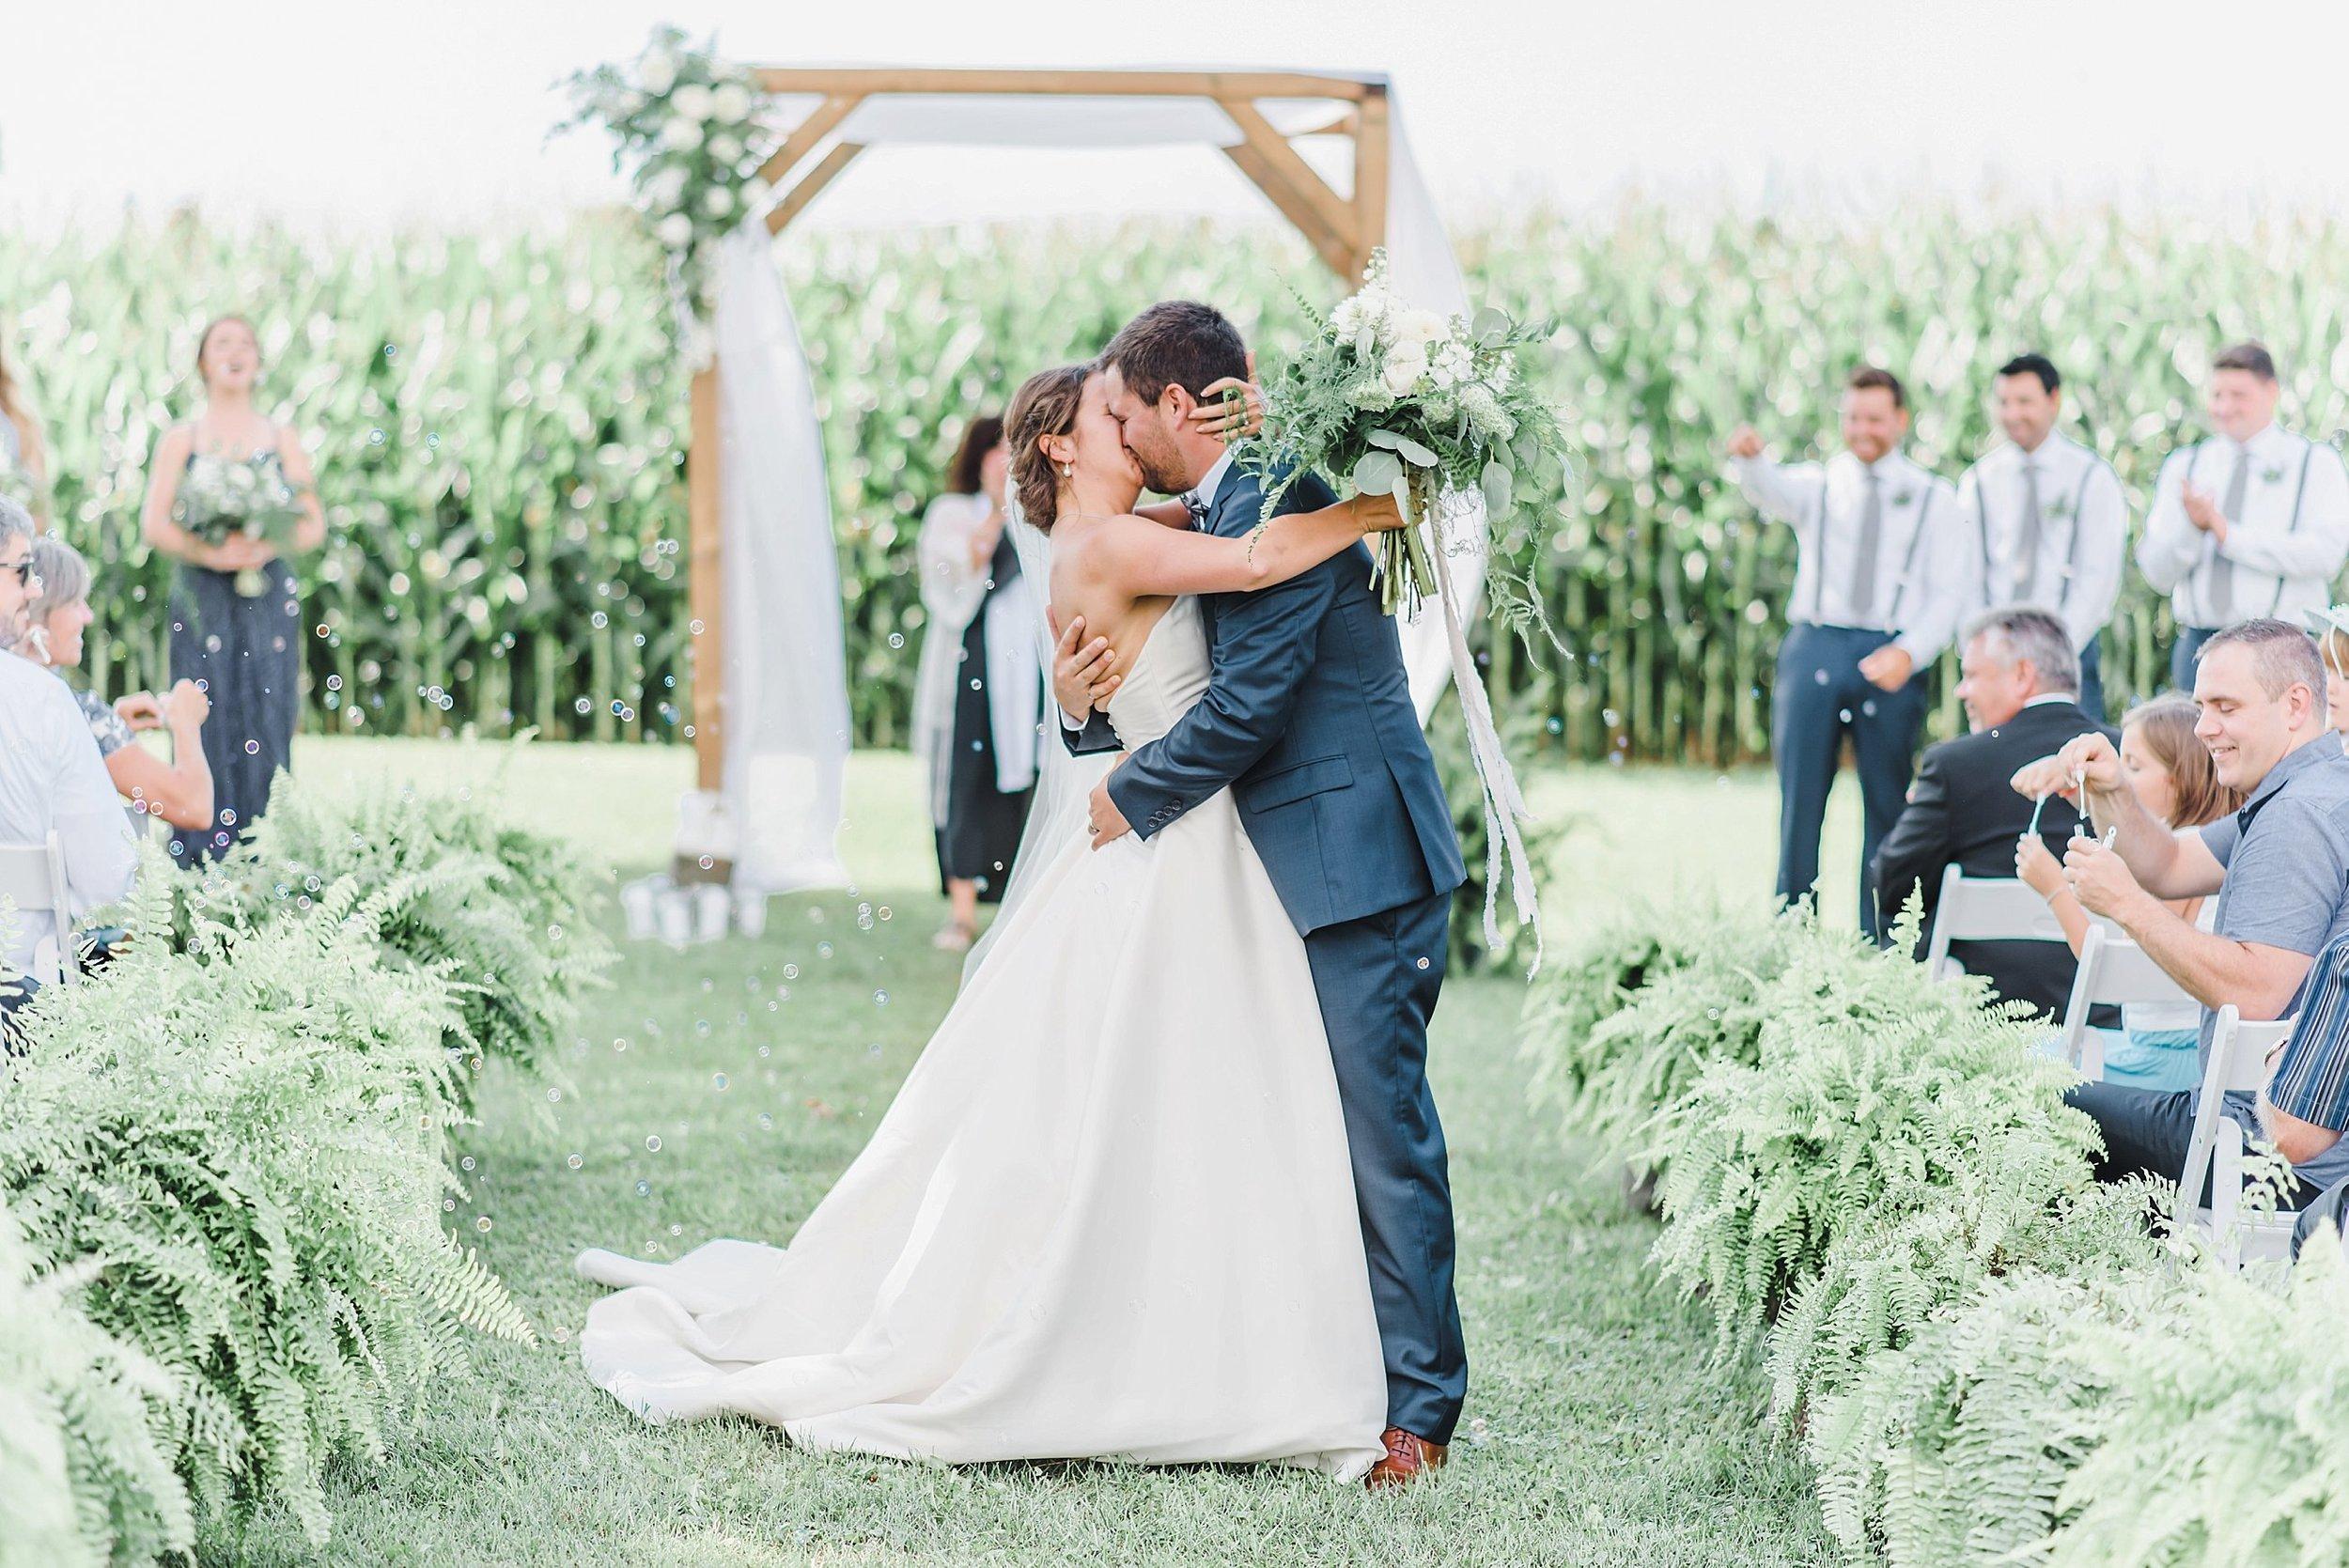 light airy indie fine art ottawa wedding photographer | Ali and Batoul Photography_0540.jpg